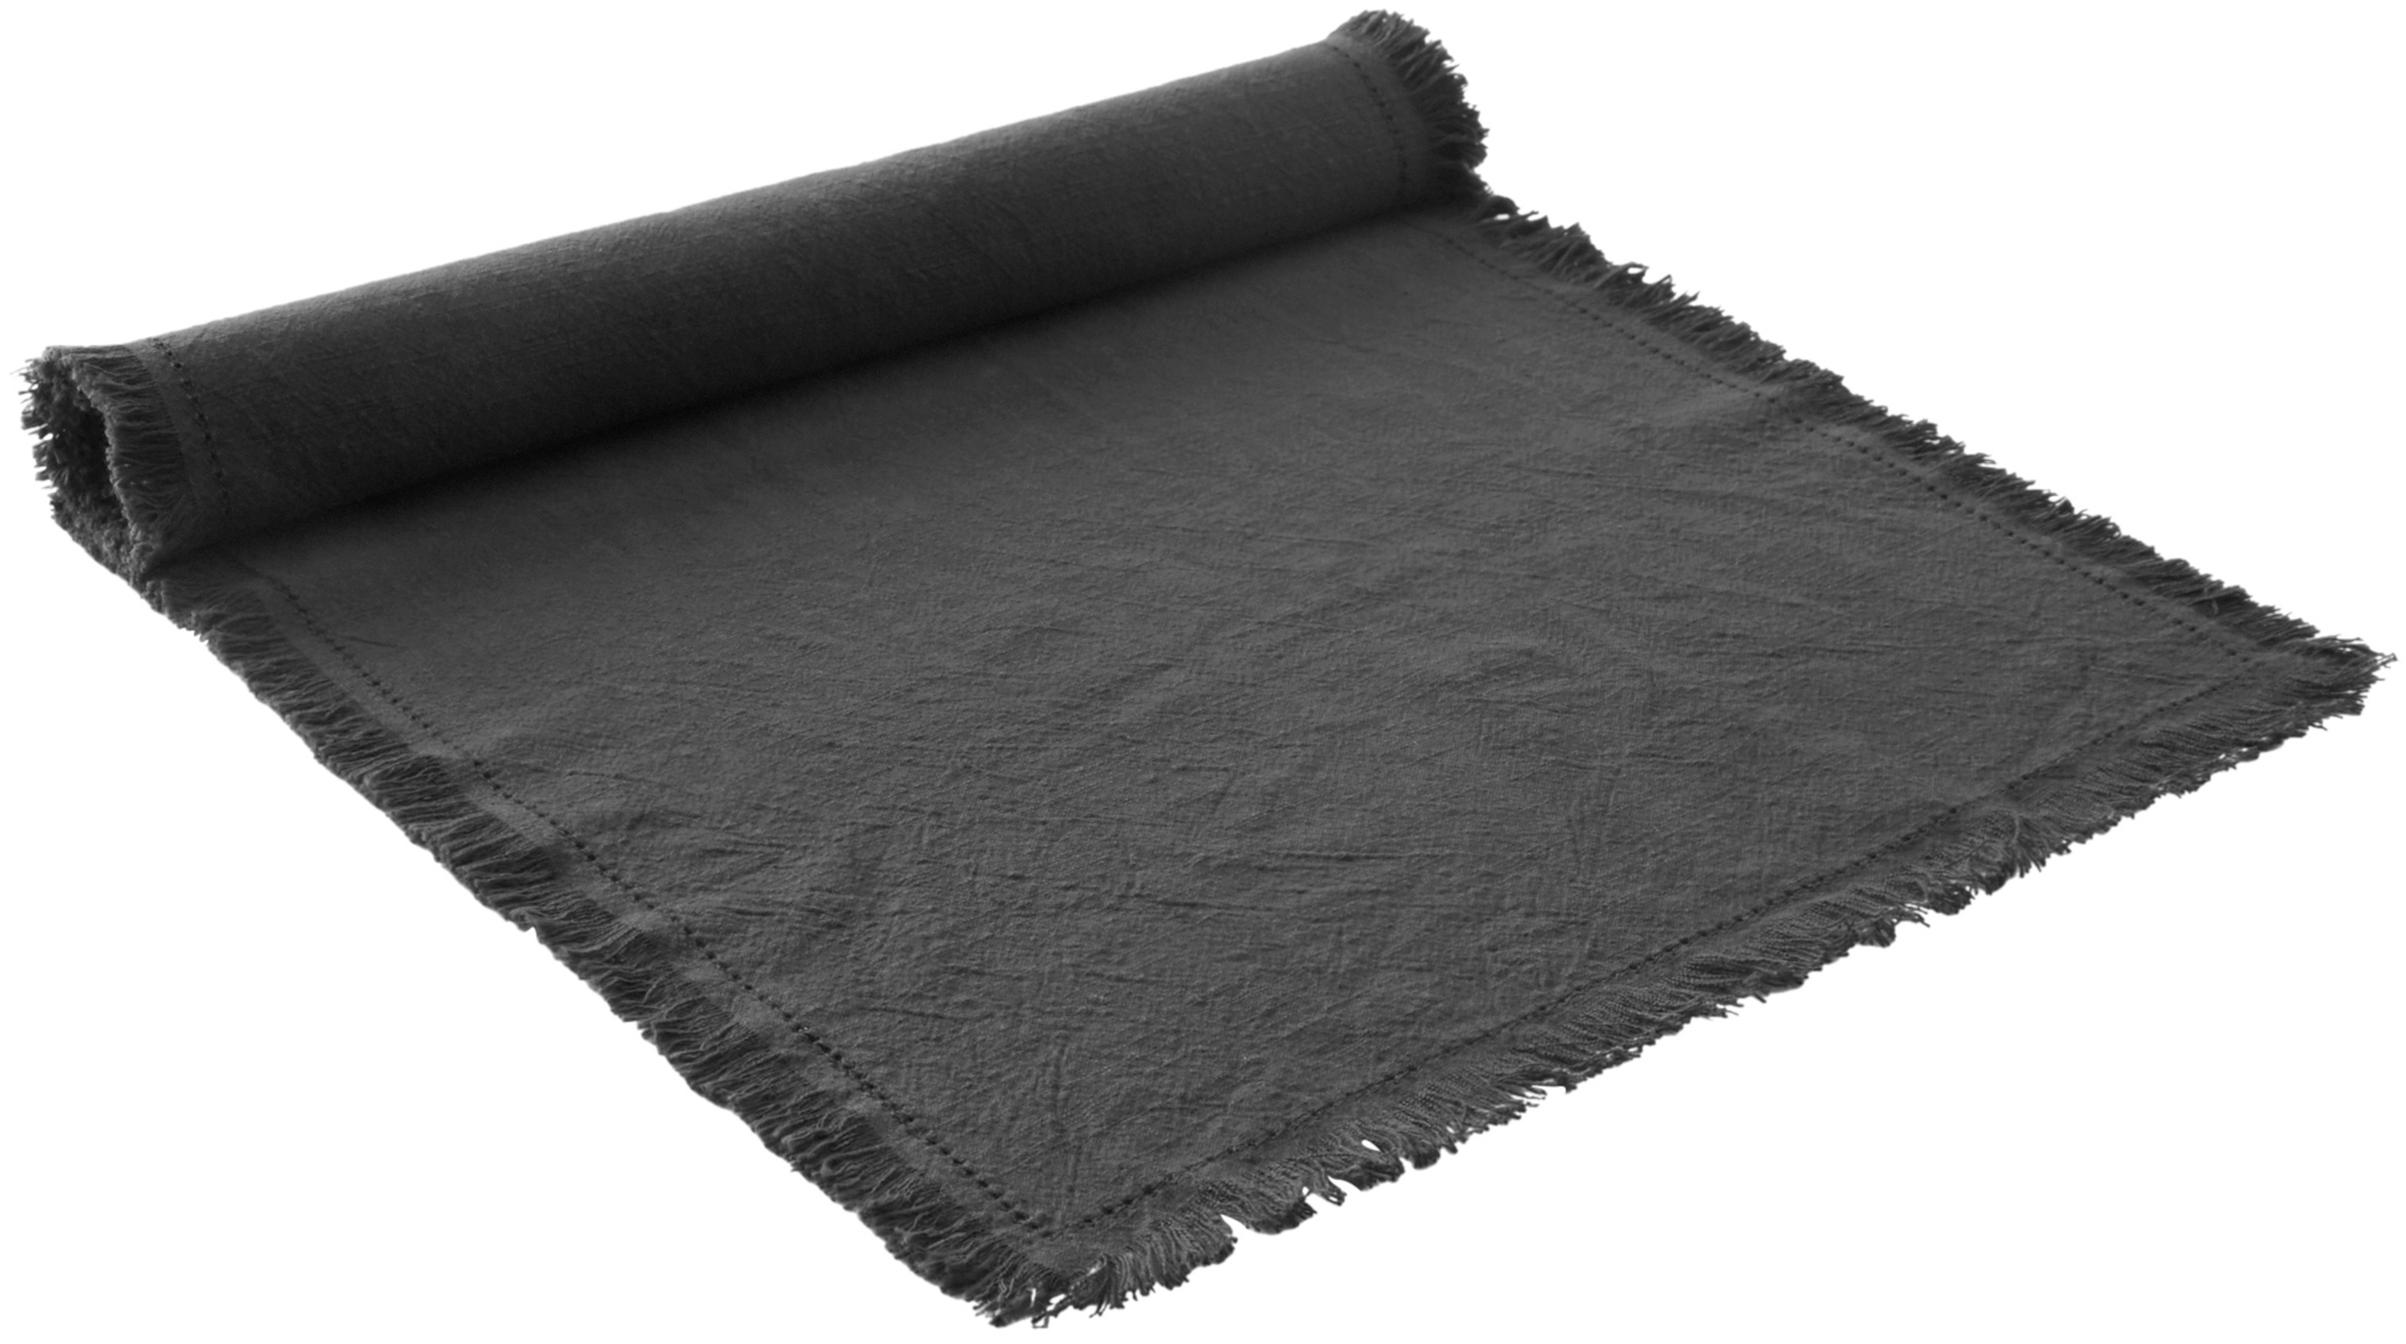 Camino de mesa Hilma, 100%algodón, Gris antracita, An 40 x L 140 cm